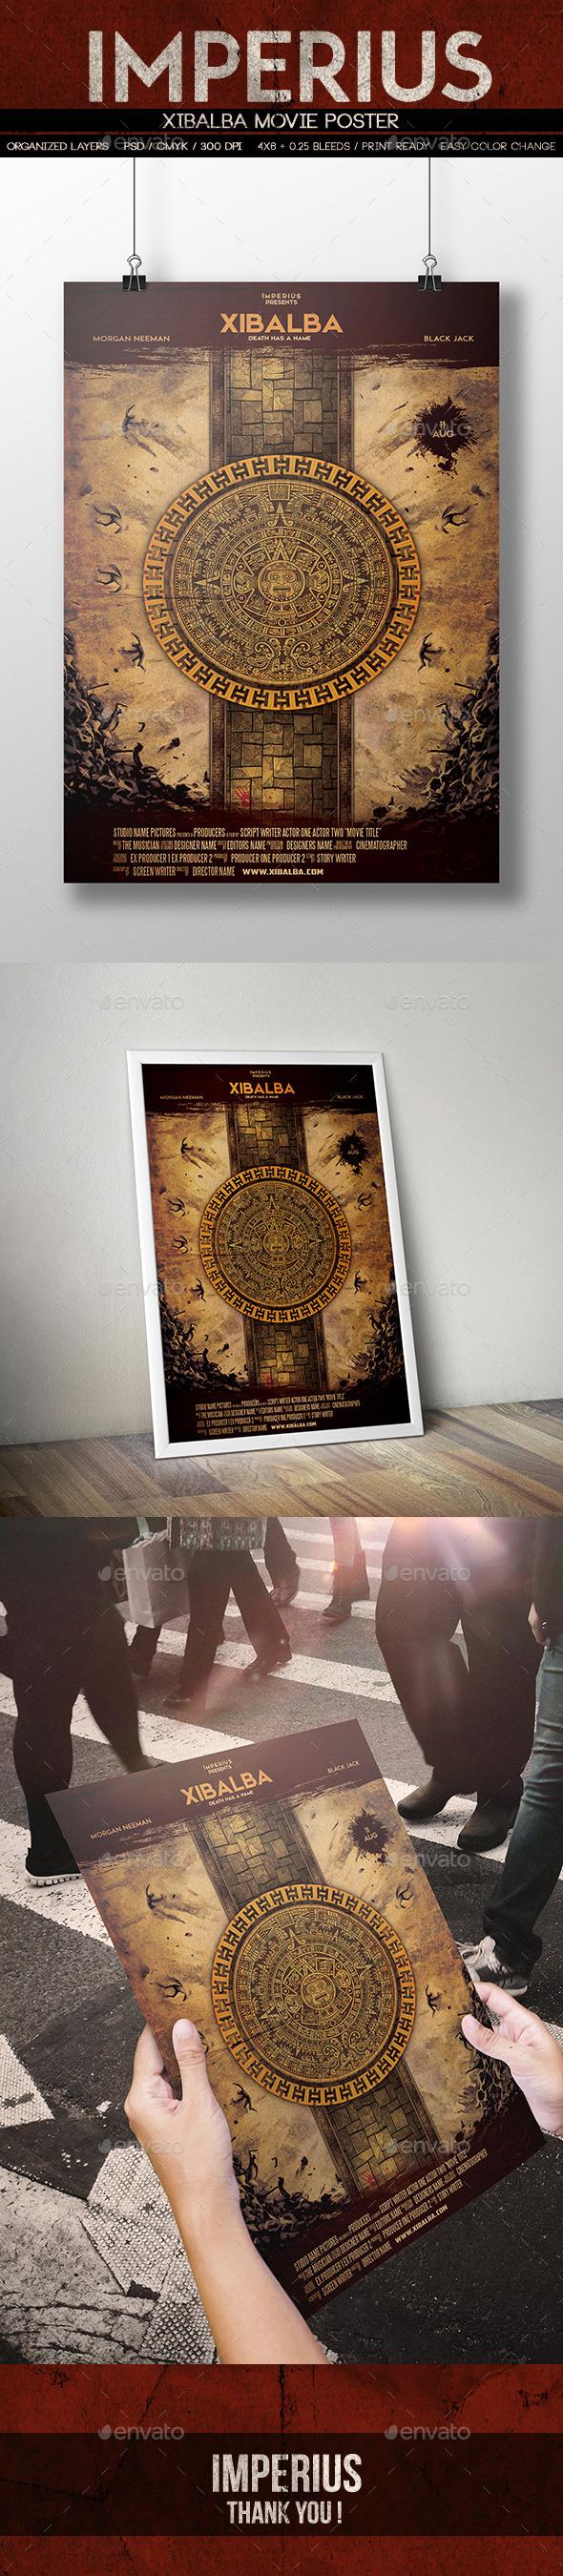 Xibalba Poster - Miscellaneous Print Templates